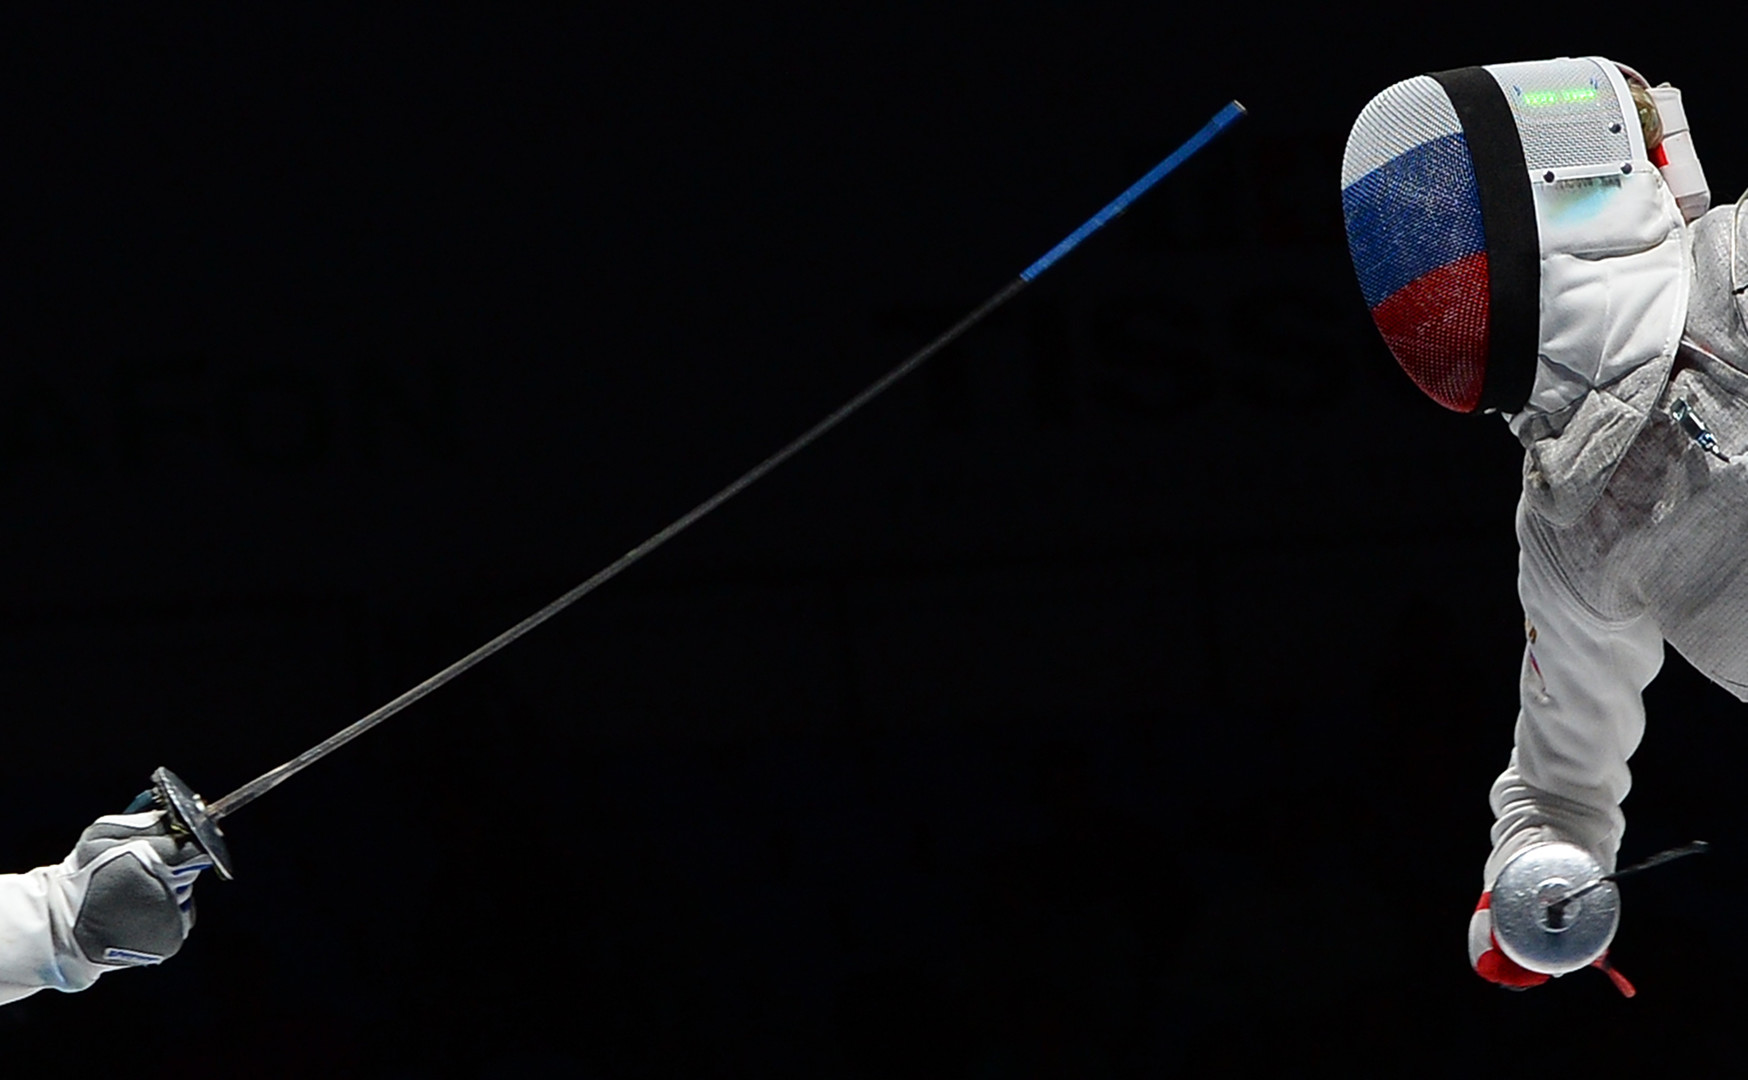 За кого болеть на Олимпиаде. Обзор пятого дня соревнований